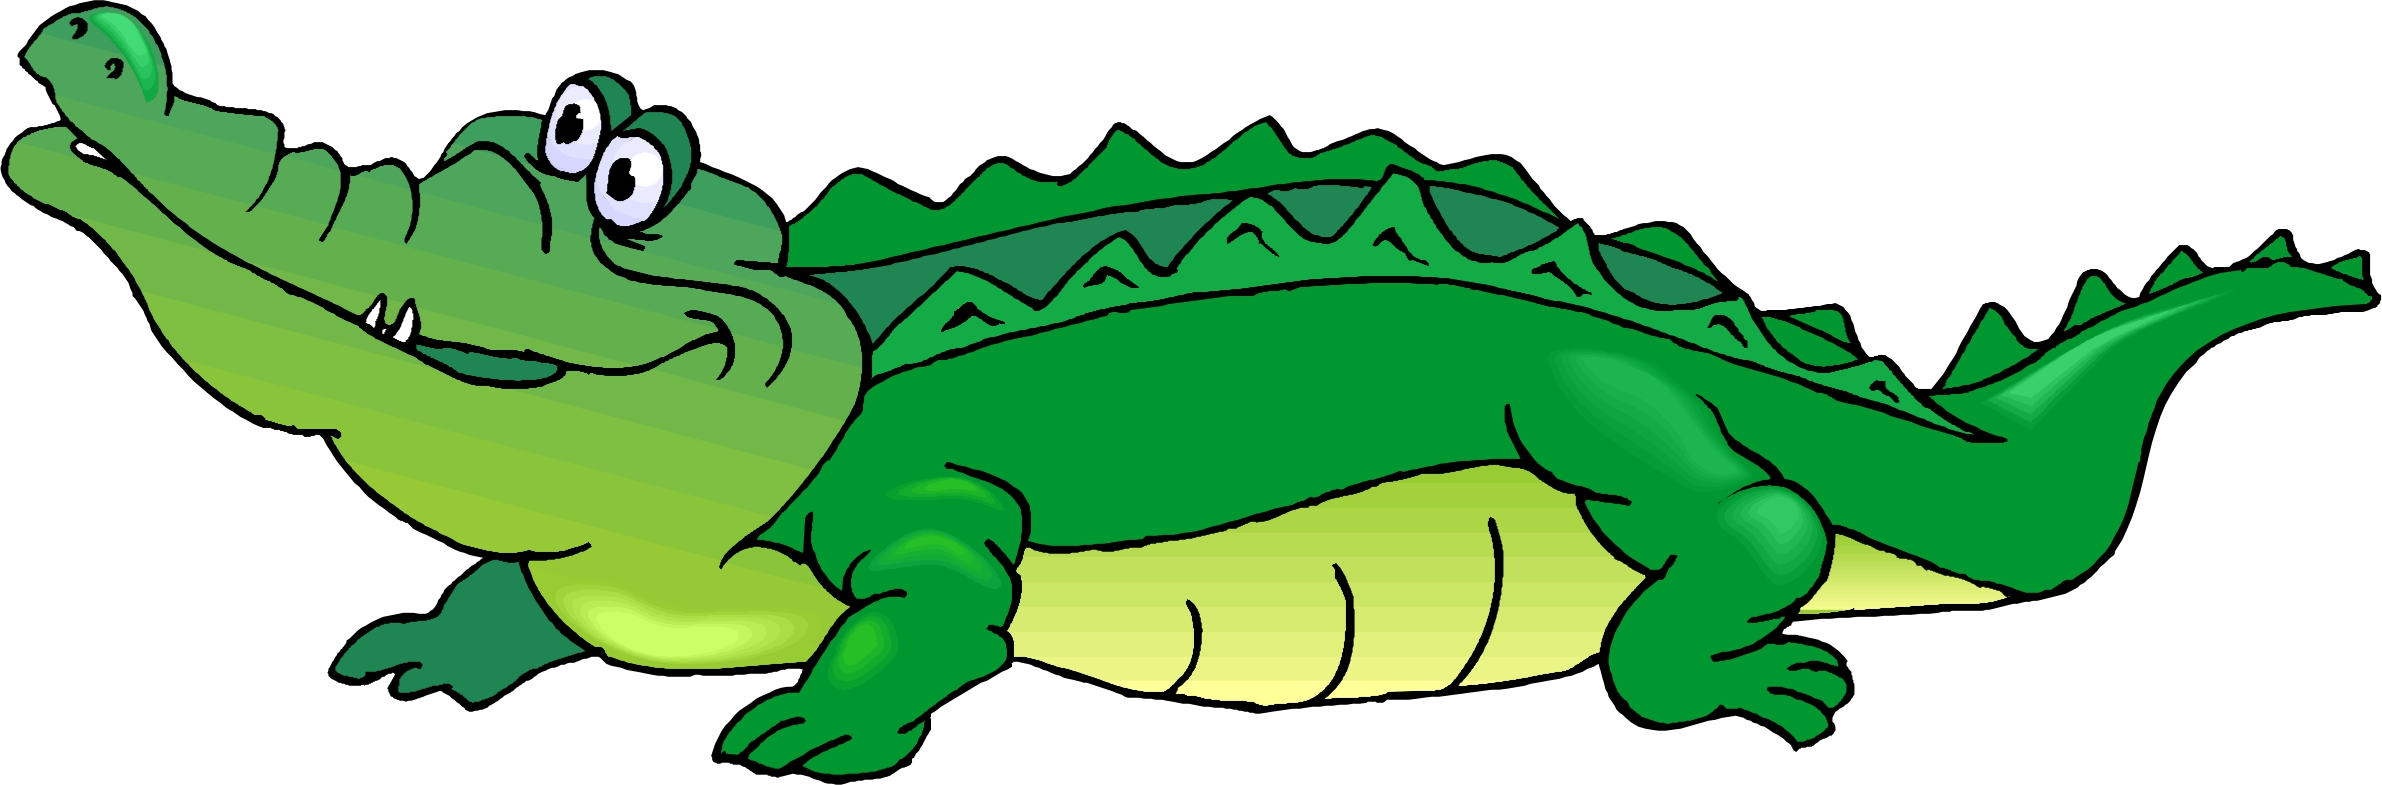 Alligator Clipart - Clipart Kid